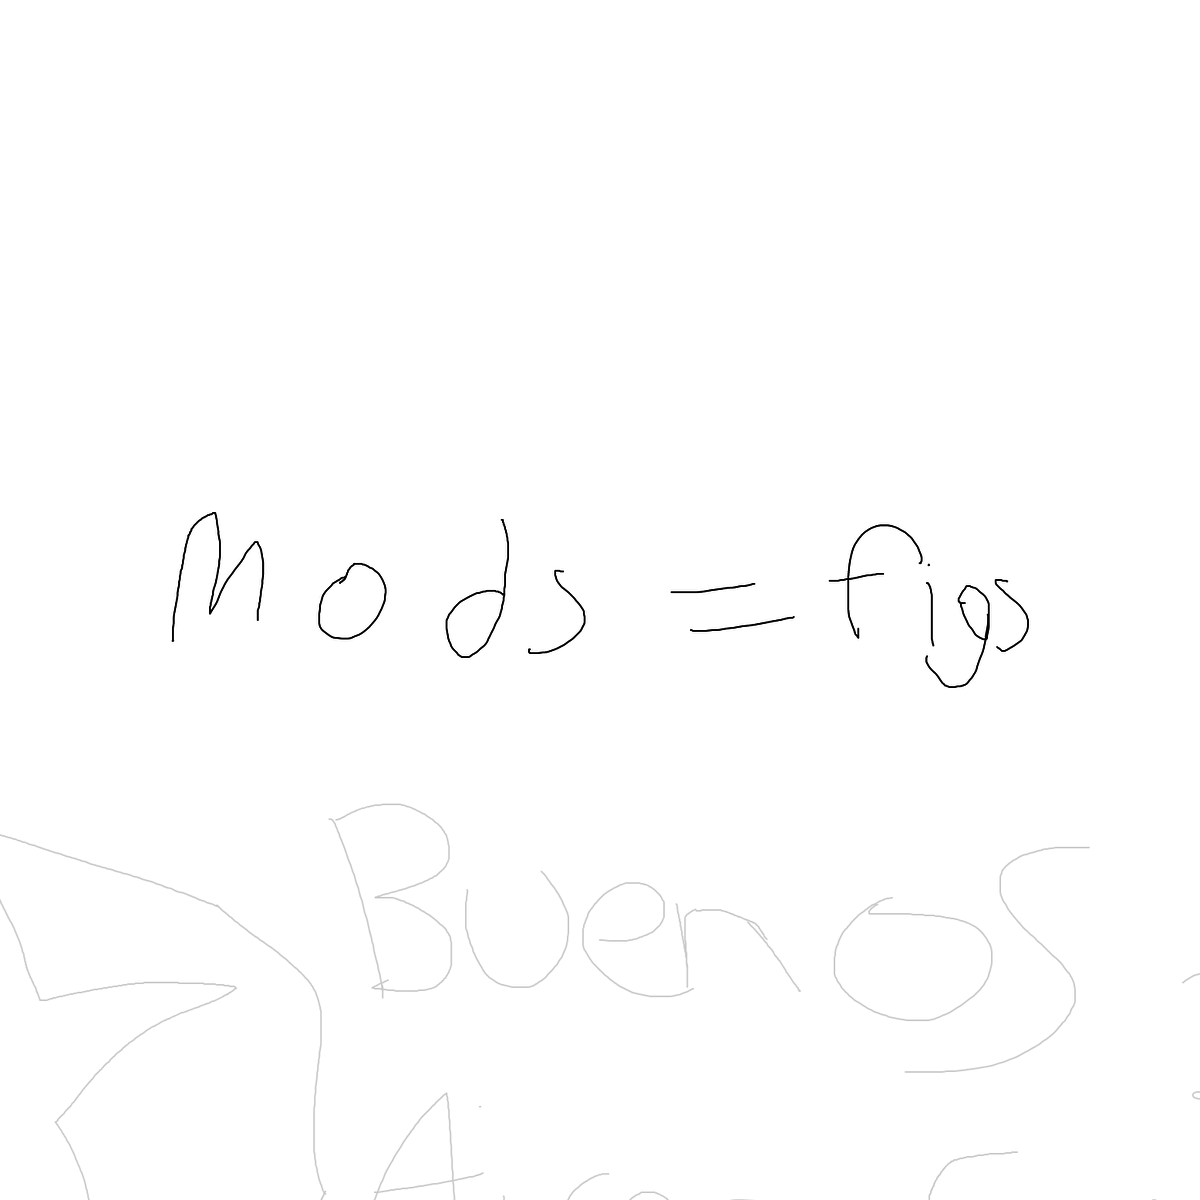 BAAAM drawing#6840 lat:-12.0500030517578120lng: -51.5038909912109400